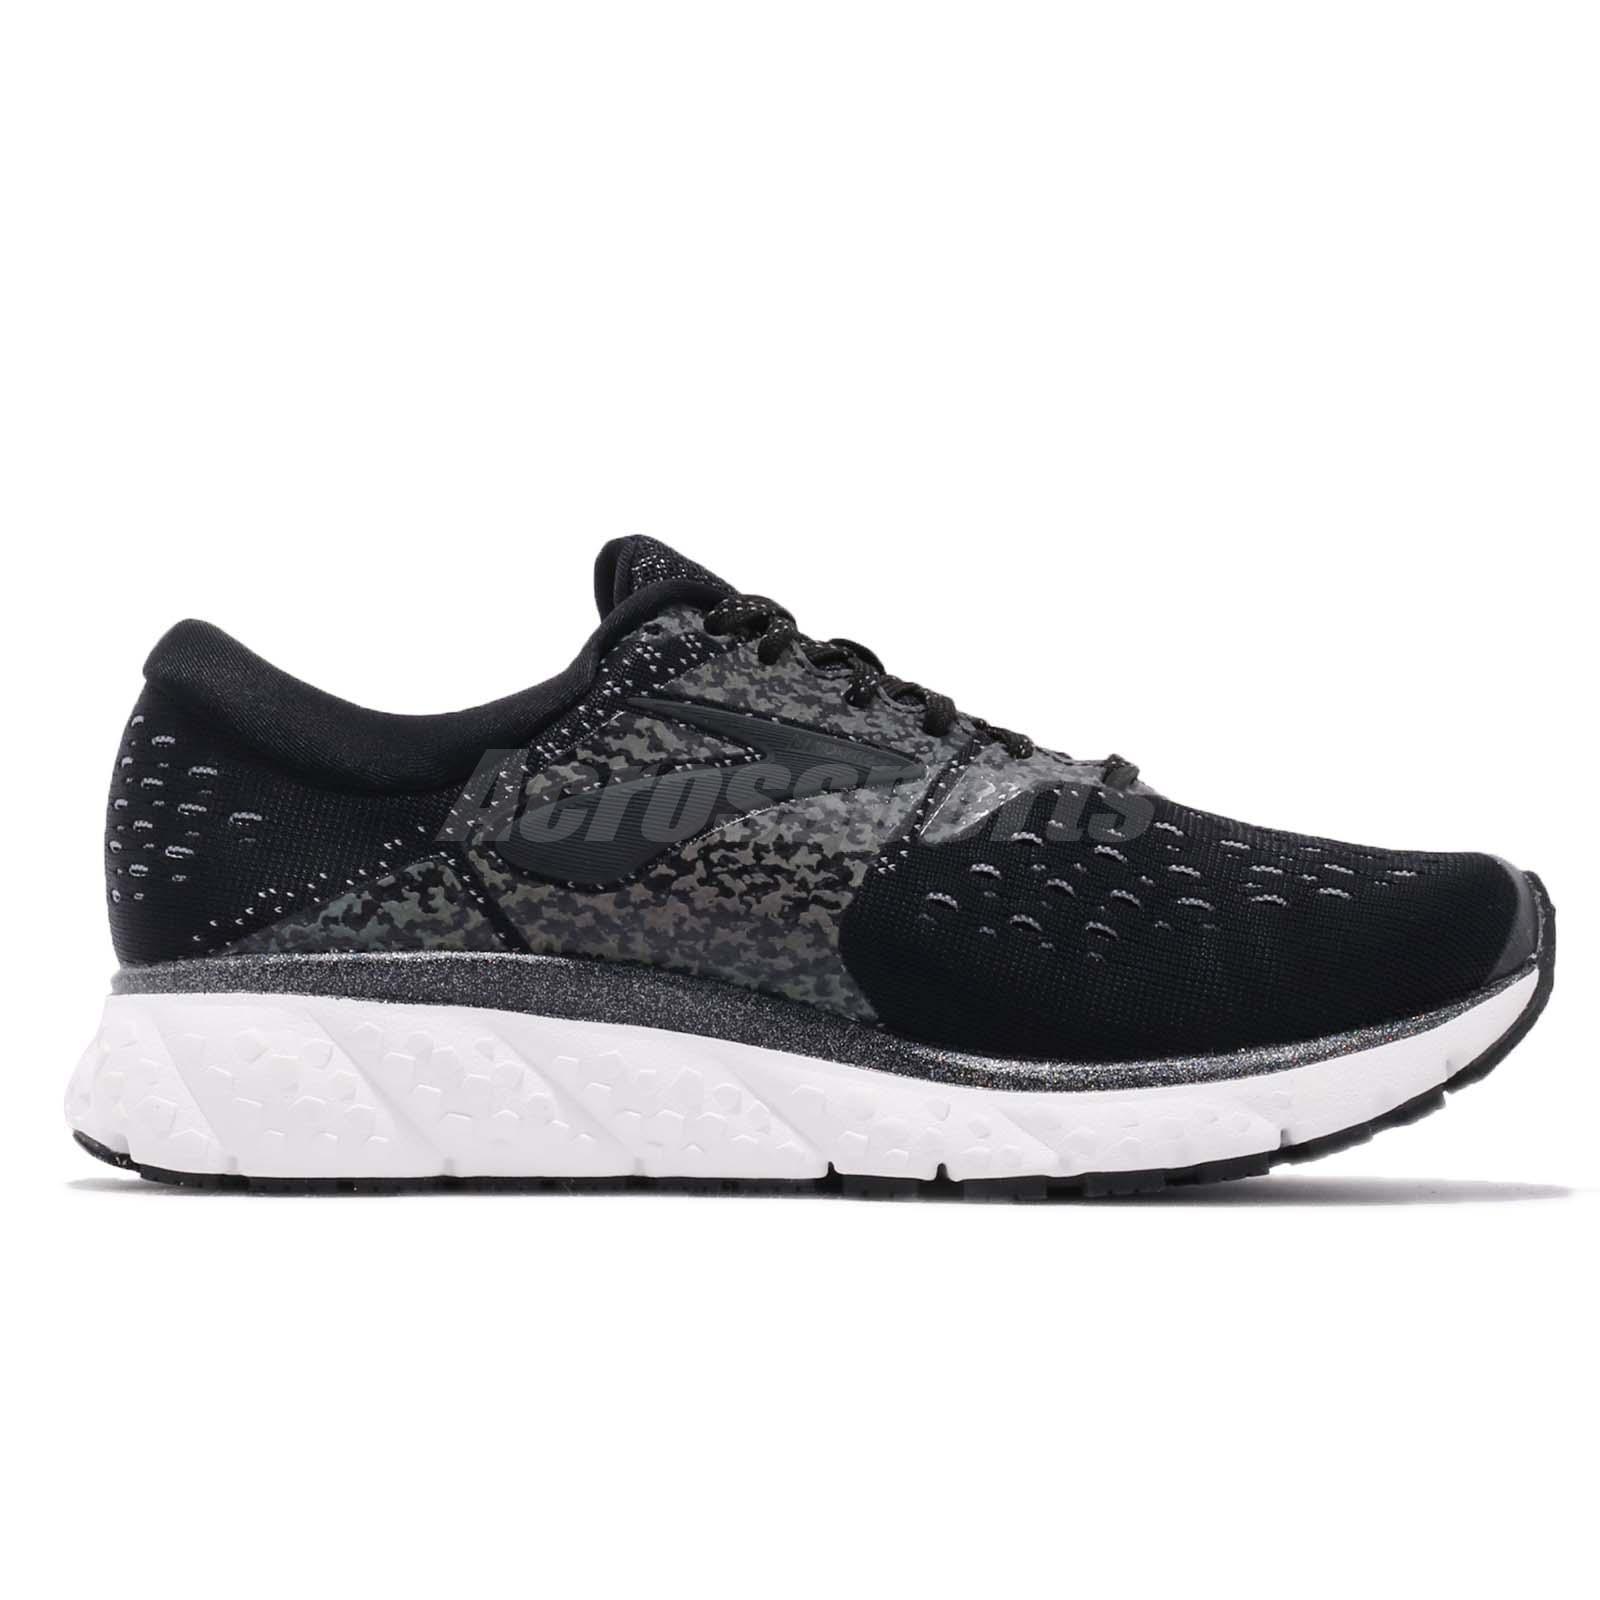 8056e52a2f941 Brooks Glycerin 16 Reflective Black White Grey Women Running Shoes ...